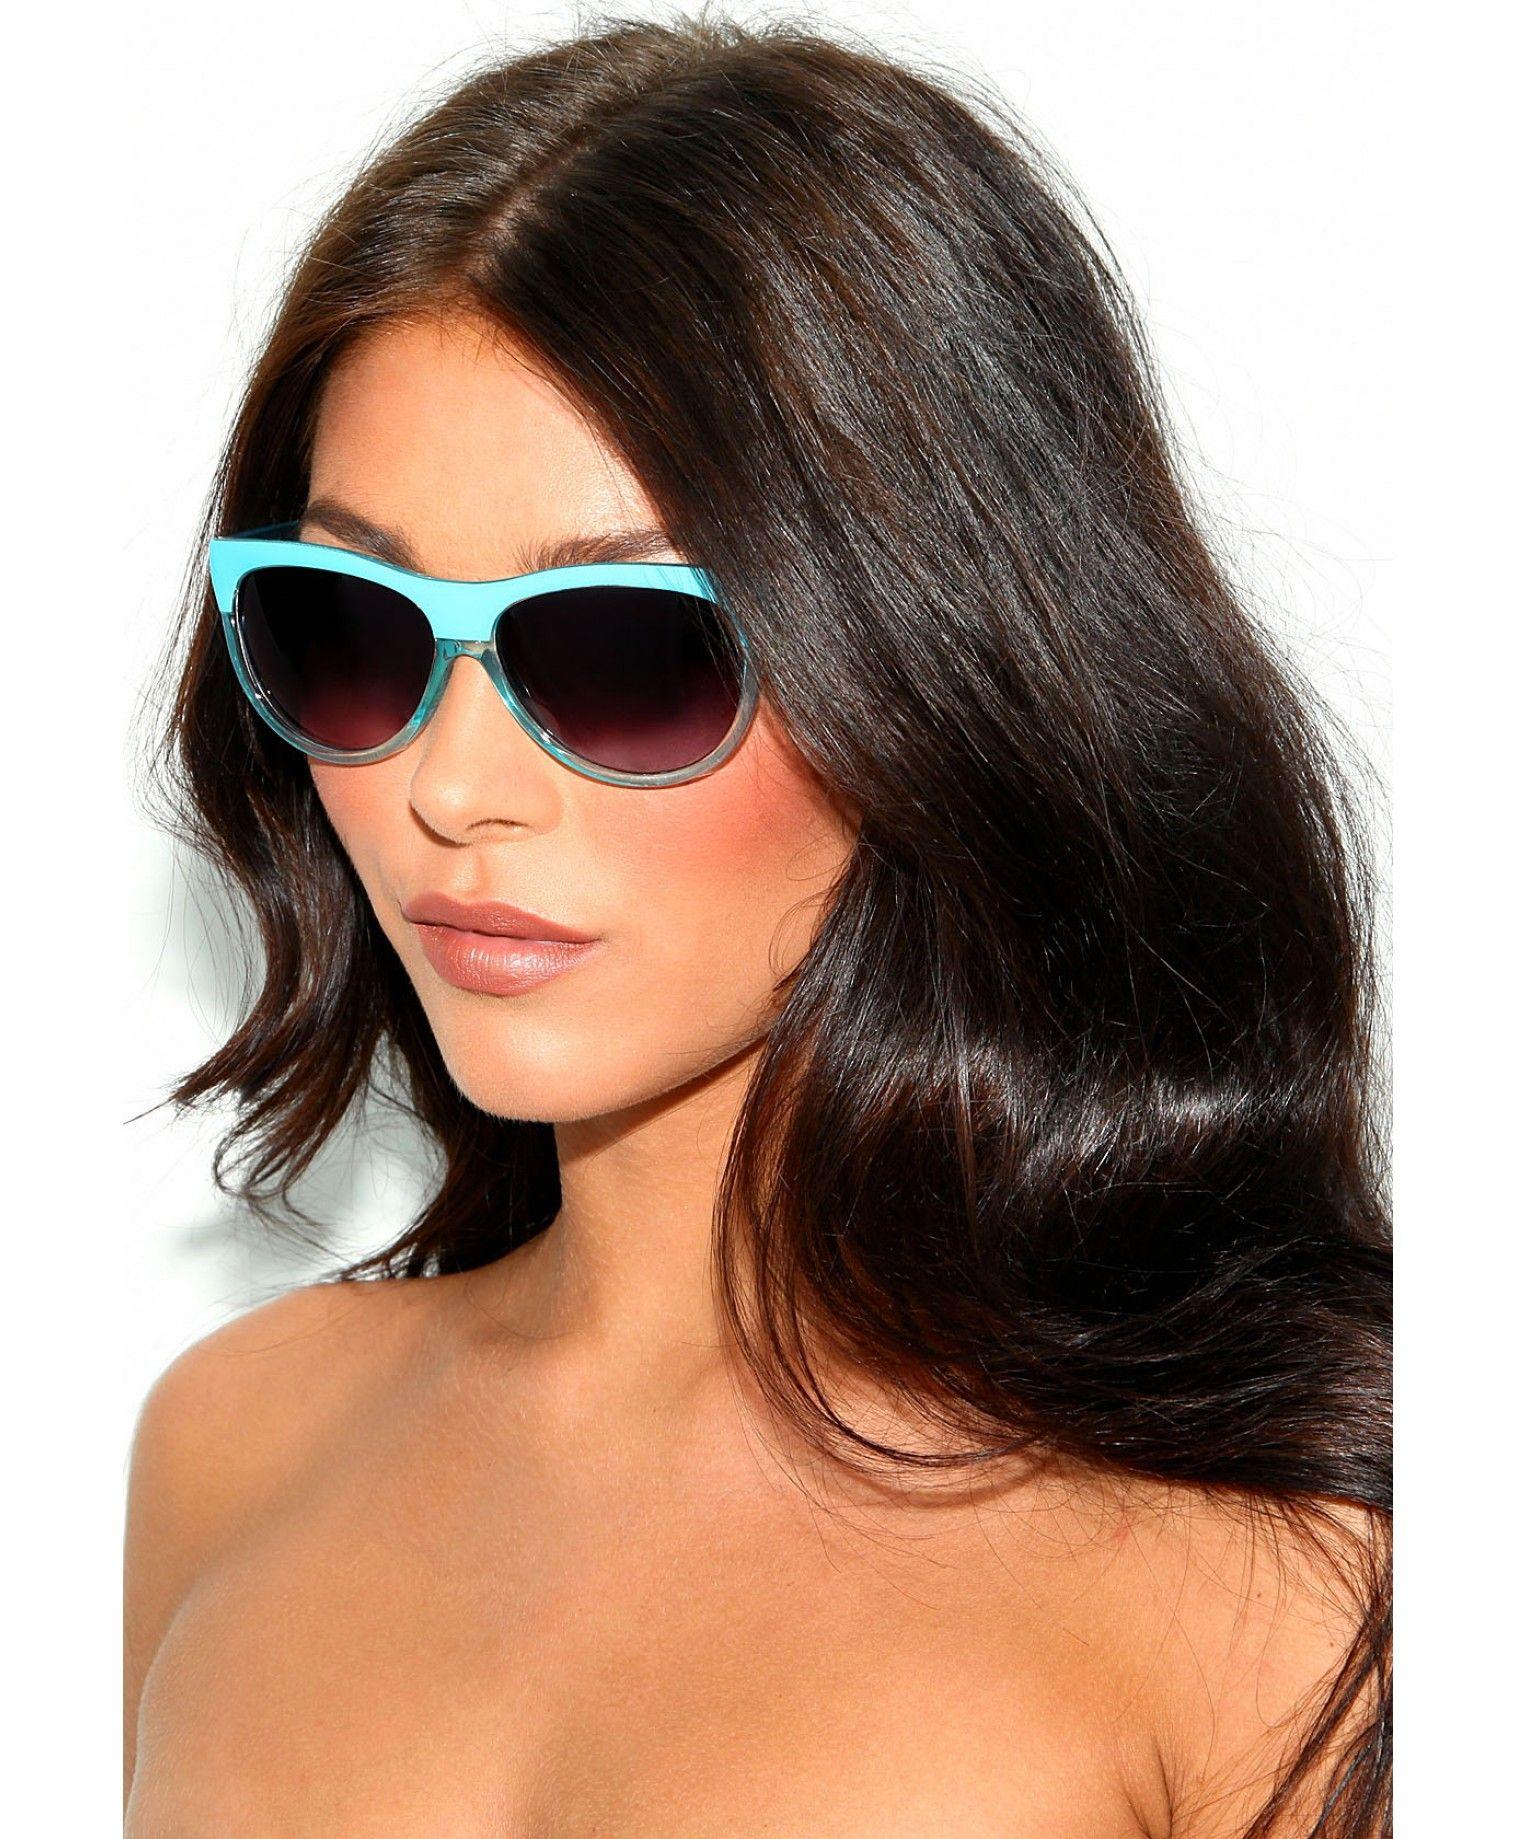 Bexin Wayfarer Sunglasses Buy sunglasses, Sunglasses